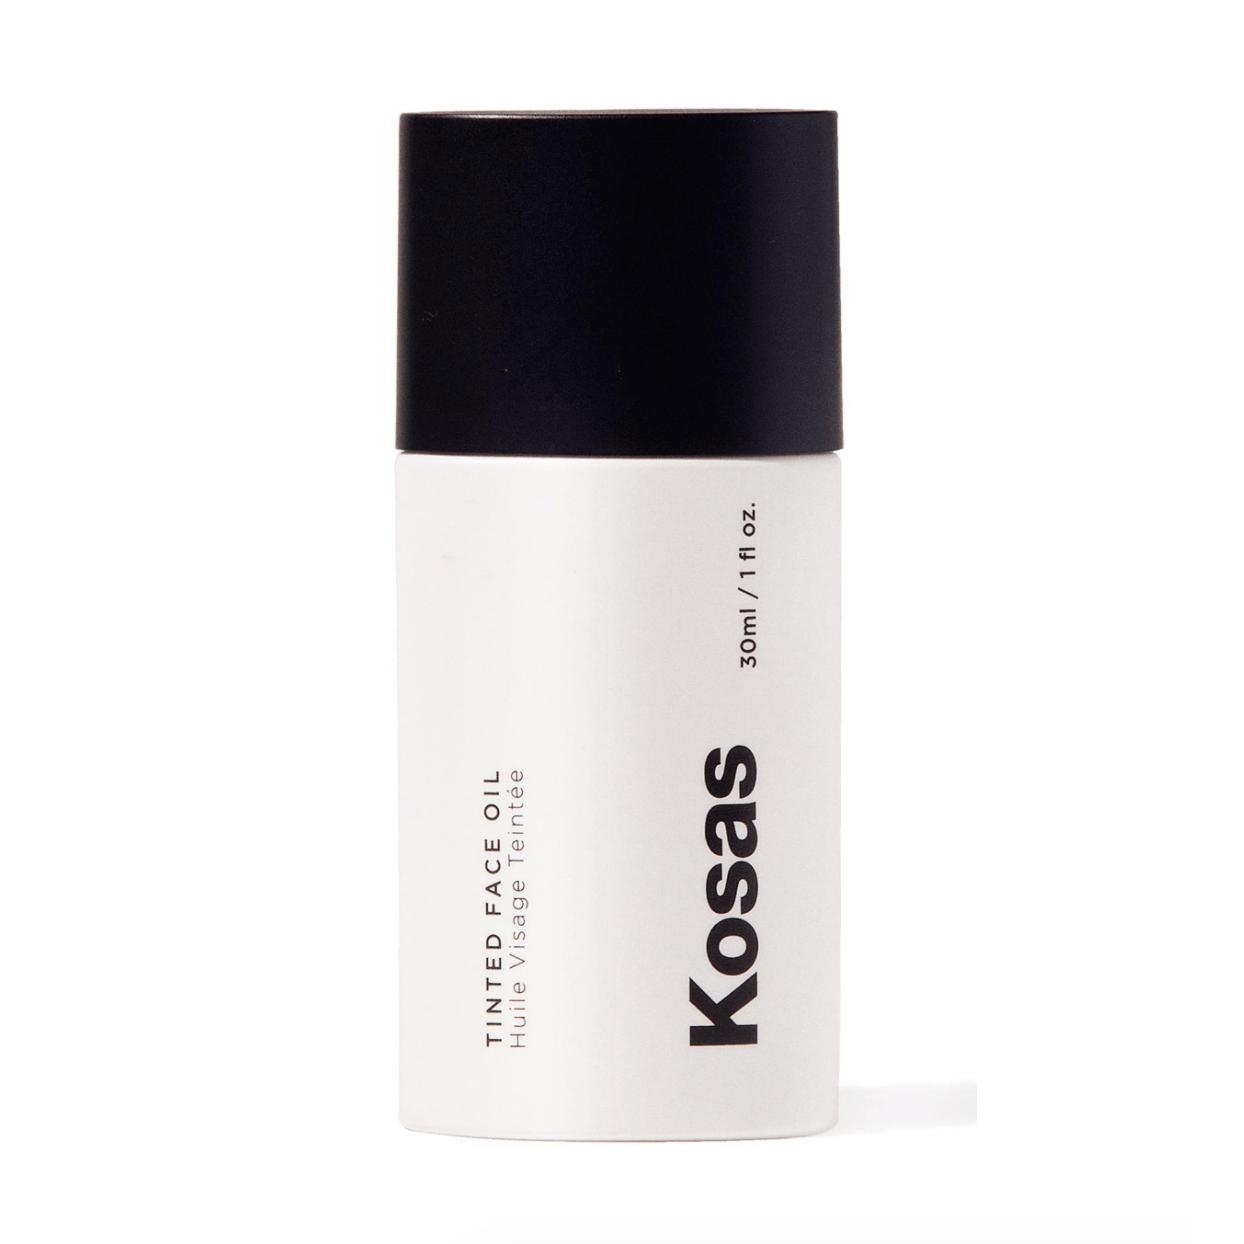 Kosas Tinted Face Oil Foundation